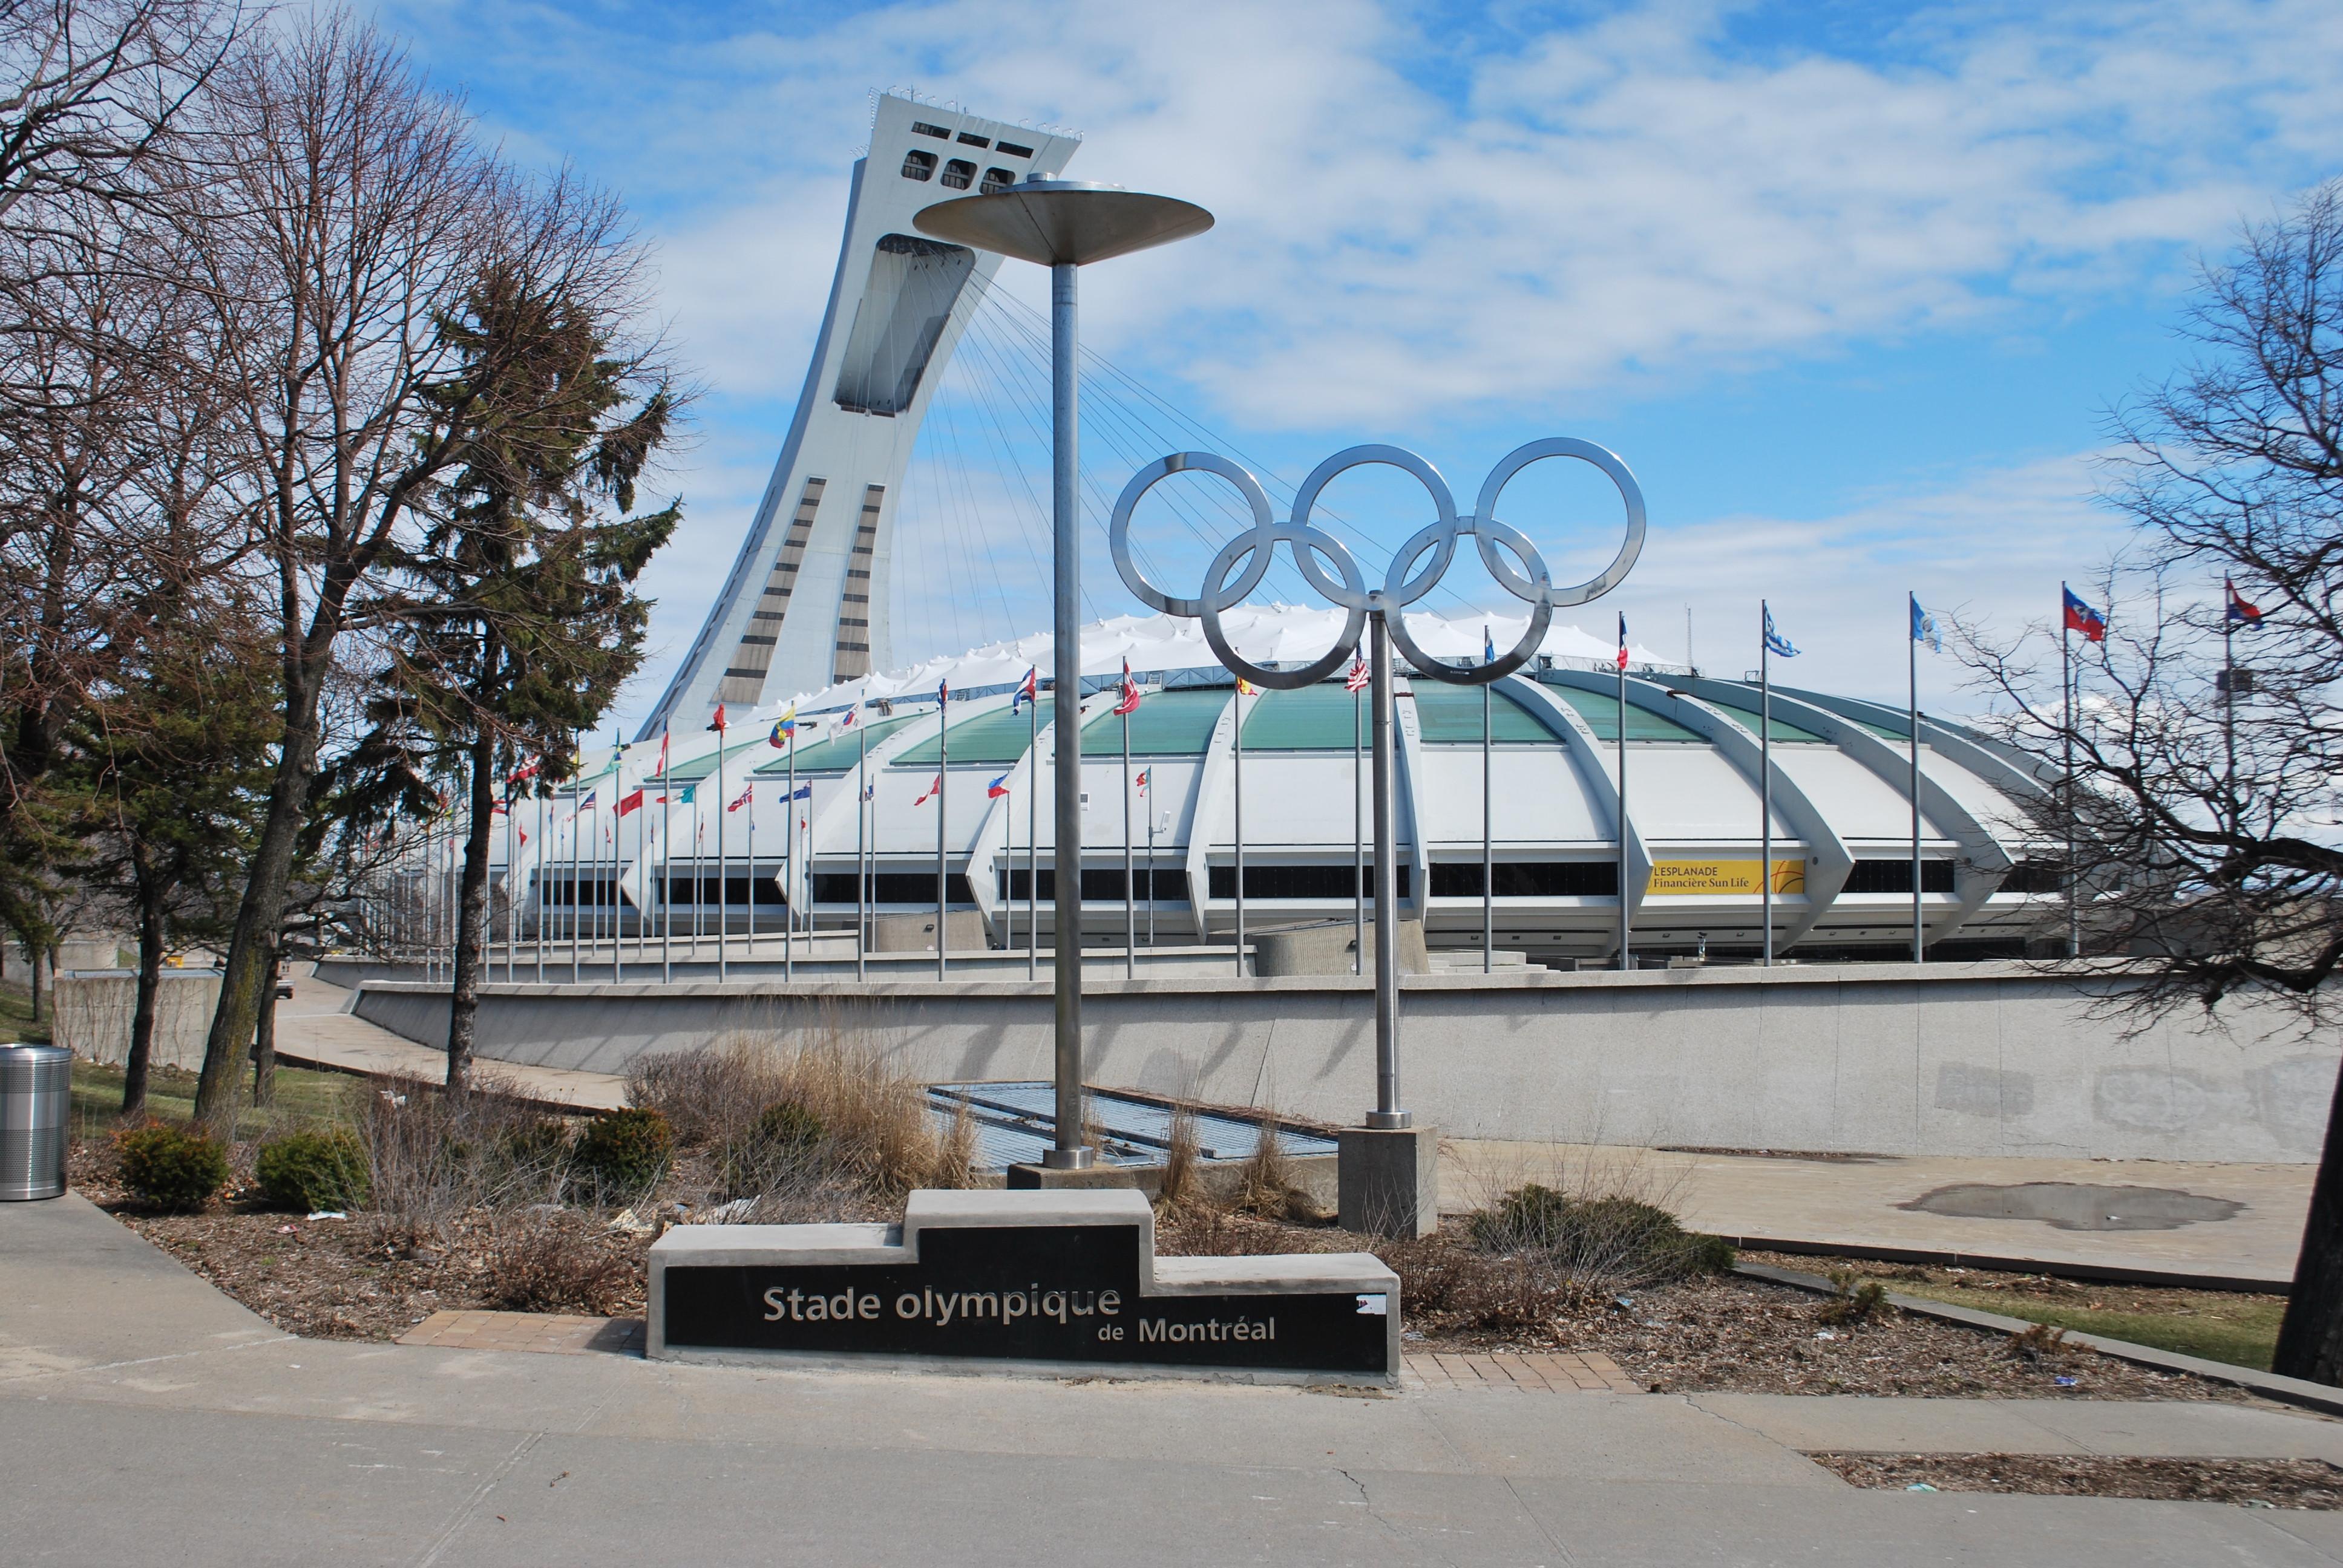 "<p>Олимпийский стадион в Монреале. Фото:&nbsp;&copy; Flickr/<a href=""https://www.flickr.com/photos/thewestend/14354611076/in/photolist-nSt8Lq-8uSEsG-5rXnic-a95m6Q-oZEBKj-2qP2j-8E5SKU-5mumnw-8E2EC2-6Ye2wC-8uWMwf-cWhi-qoB6wY-bZYDgq-WJfdeQ-5munPu-8sYRhd-5mumt1-5rXq7z-5mq7JD-8E2HKt-7VsSxW-ppD433-qCSPNy-paaT4M-5RYnLA-p2oJBF-5muhWs-prDrAy-8E2Jn4-8sVPXP-nscKPe-8E2Jbx-5mq3n8-5mq39i-8mpTvs-8E2HzM-5mq3gi-8E2JeK-5muiGf-paaT5P-fT3M4S-5mq4pV-5mq74e-5muj73-8E5SEs-8E2HwB-8E2HHr-8sYP4N-3ZnWs"">The West End</a></p>"